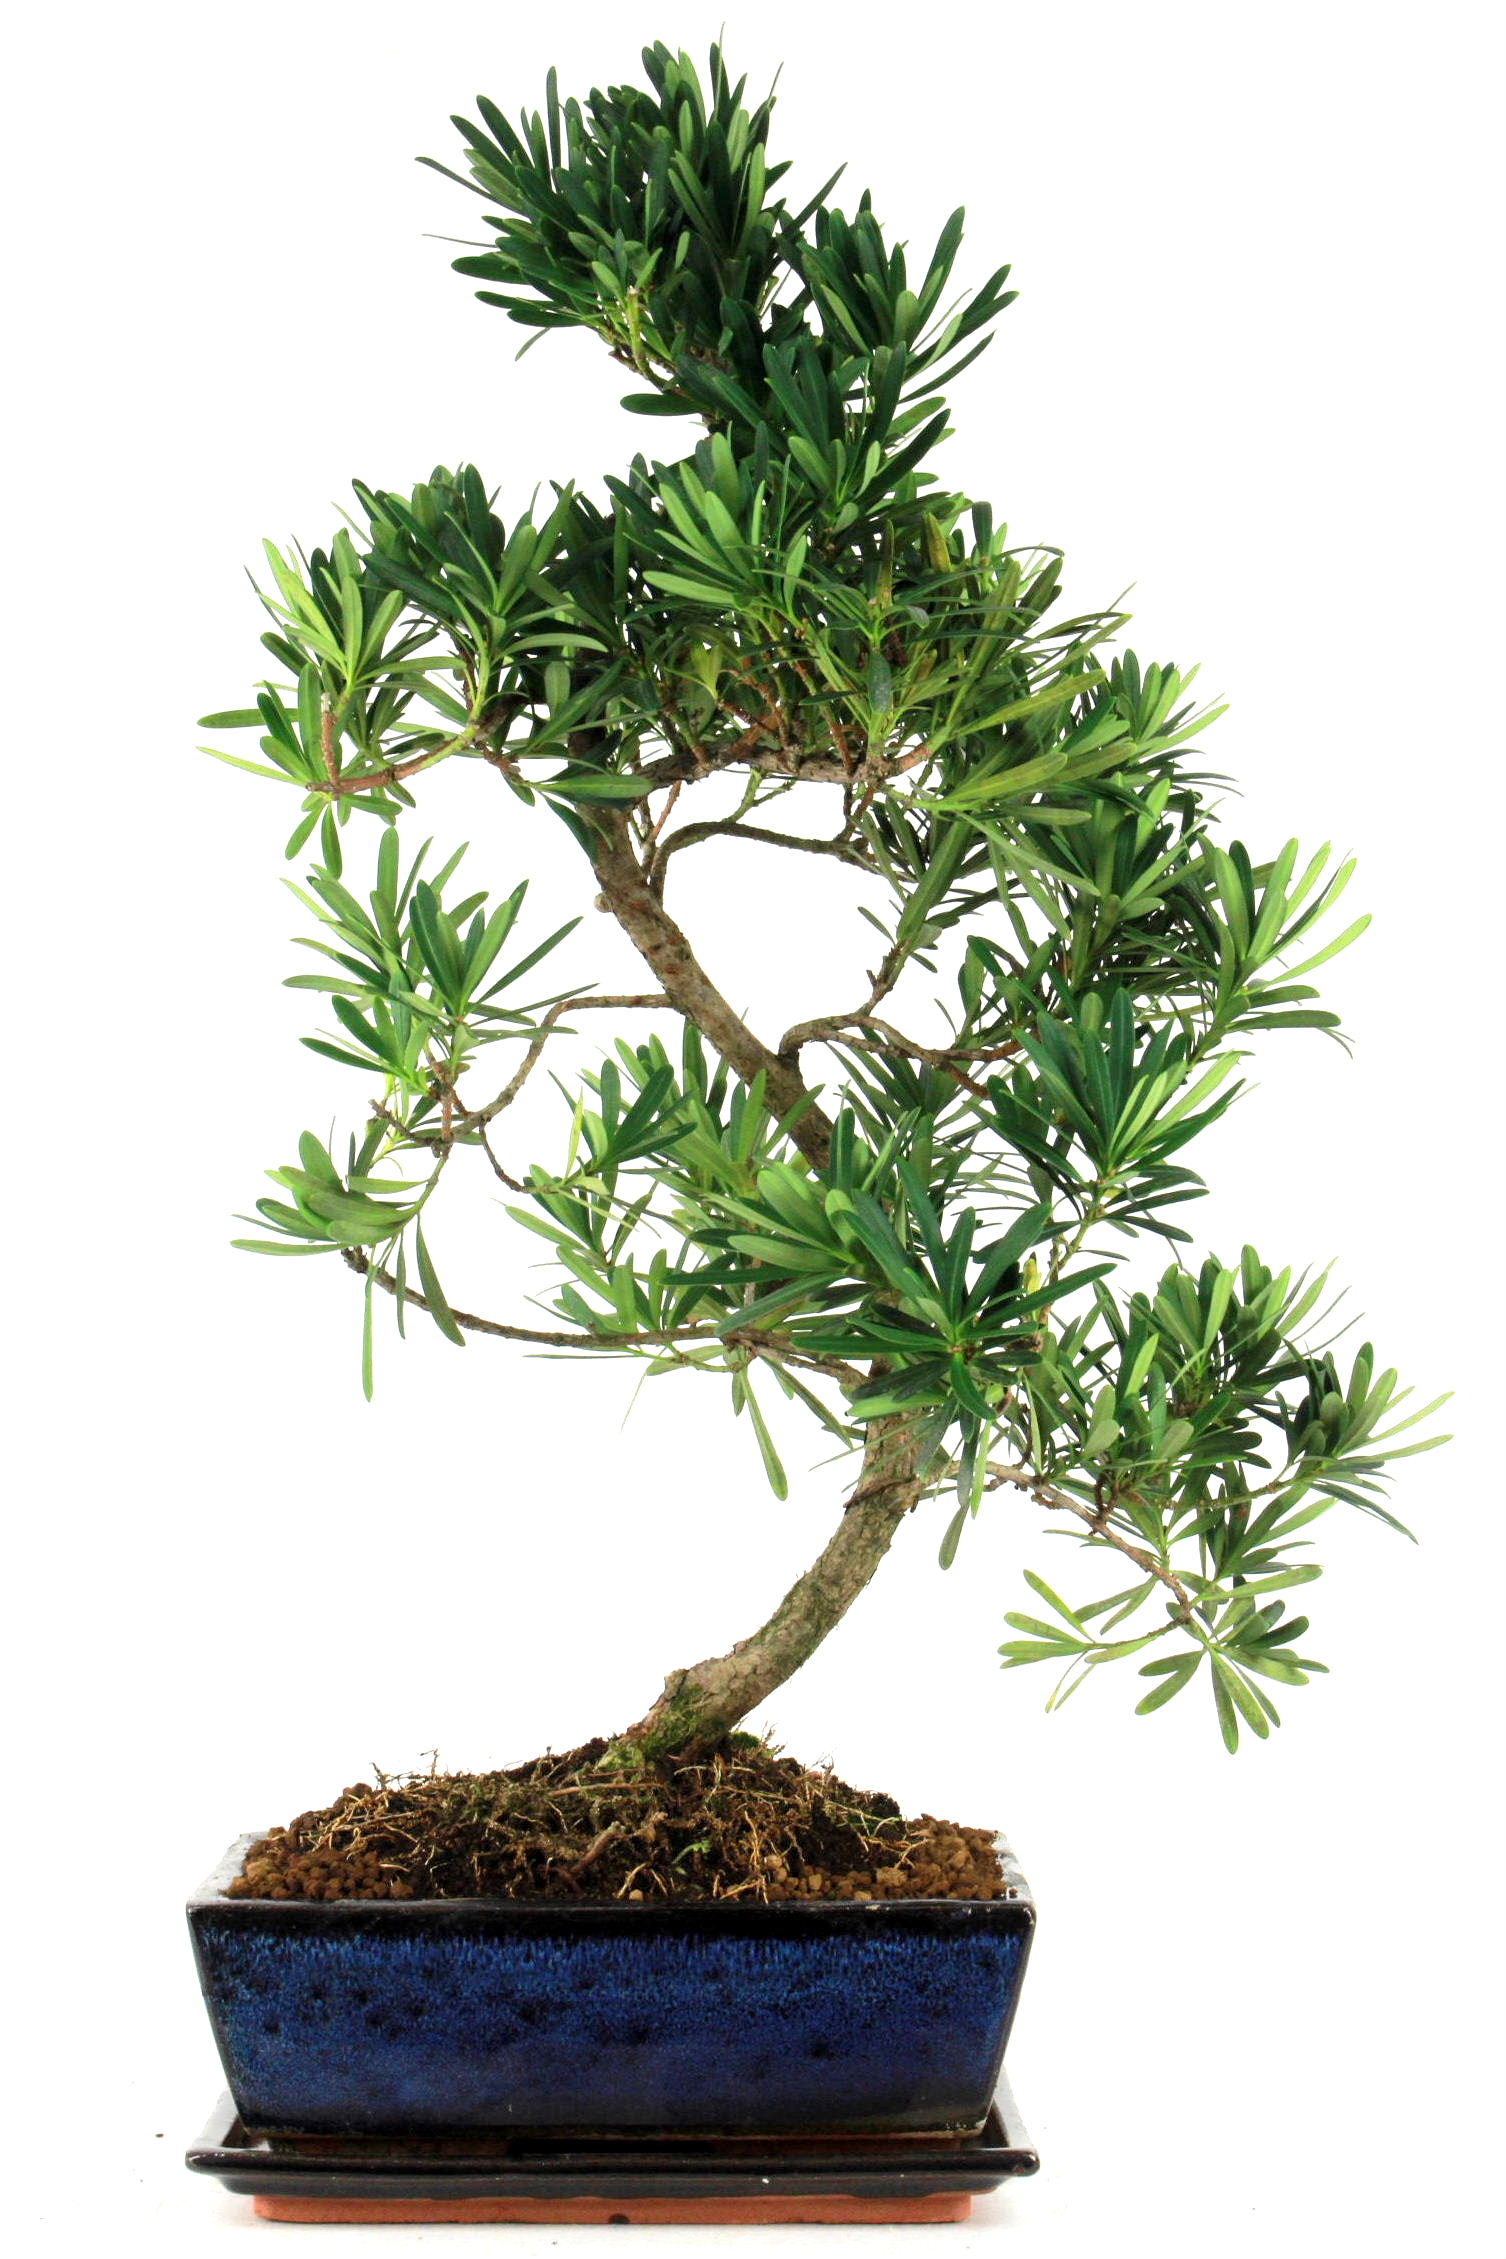 steineibe bonsai 50 55 cm 226 bei oyaki bonsai kaufen. Black Bedroom Furniture Sets. Home Design Ideas